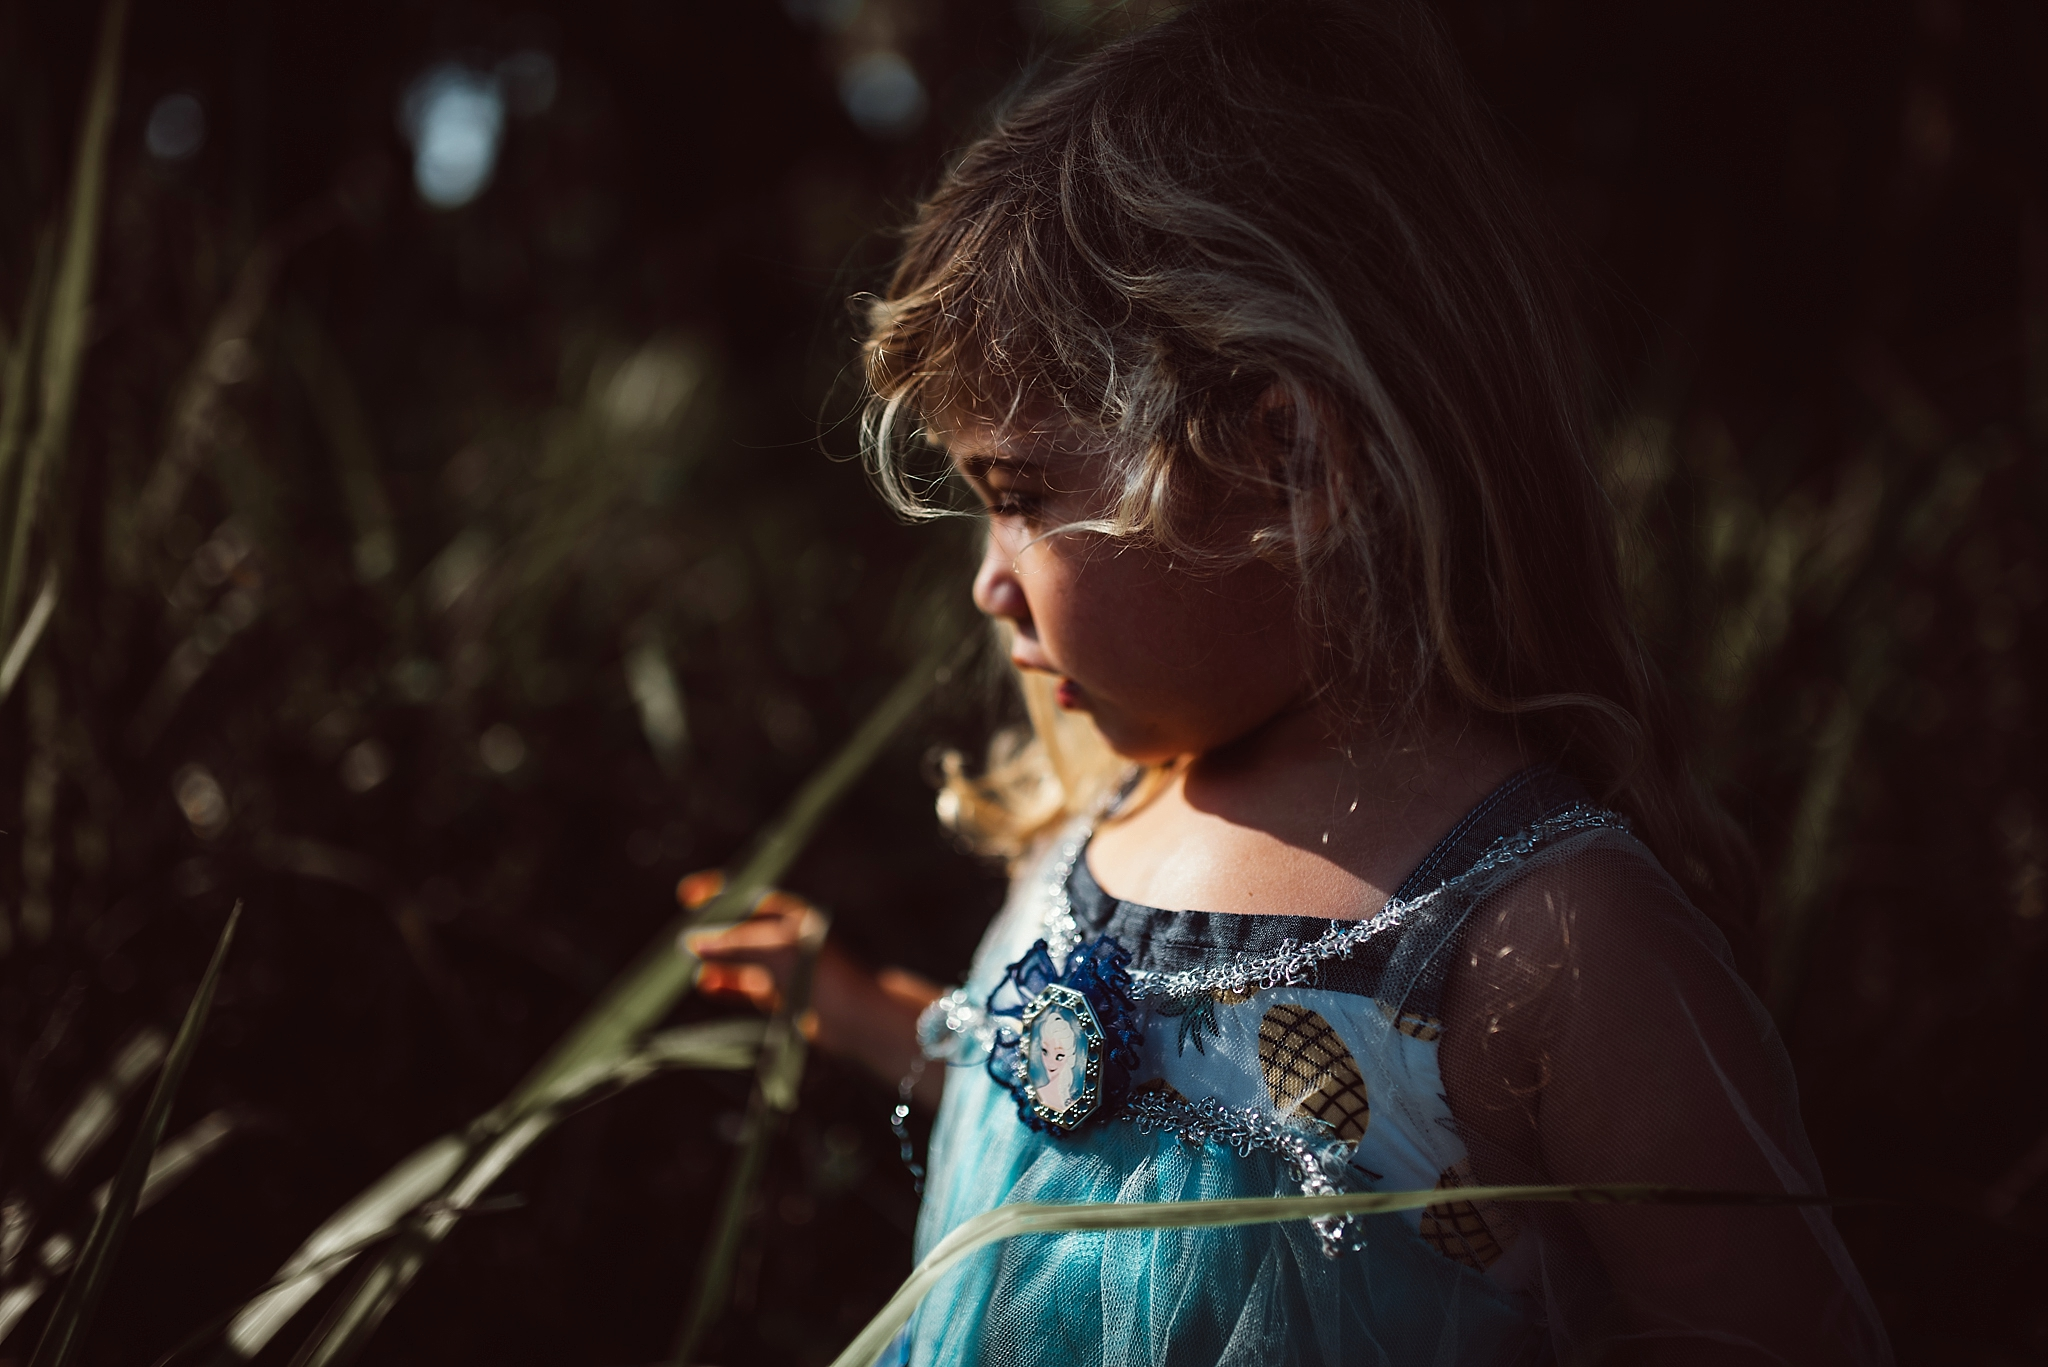 twyla jones photography - treasure coast - florida family photography riverbend park jupiter florida-5570.jpg